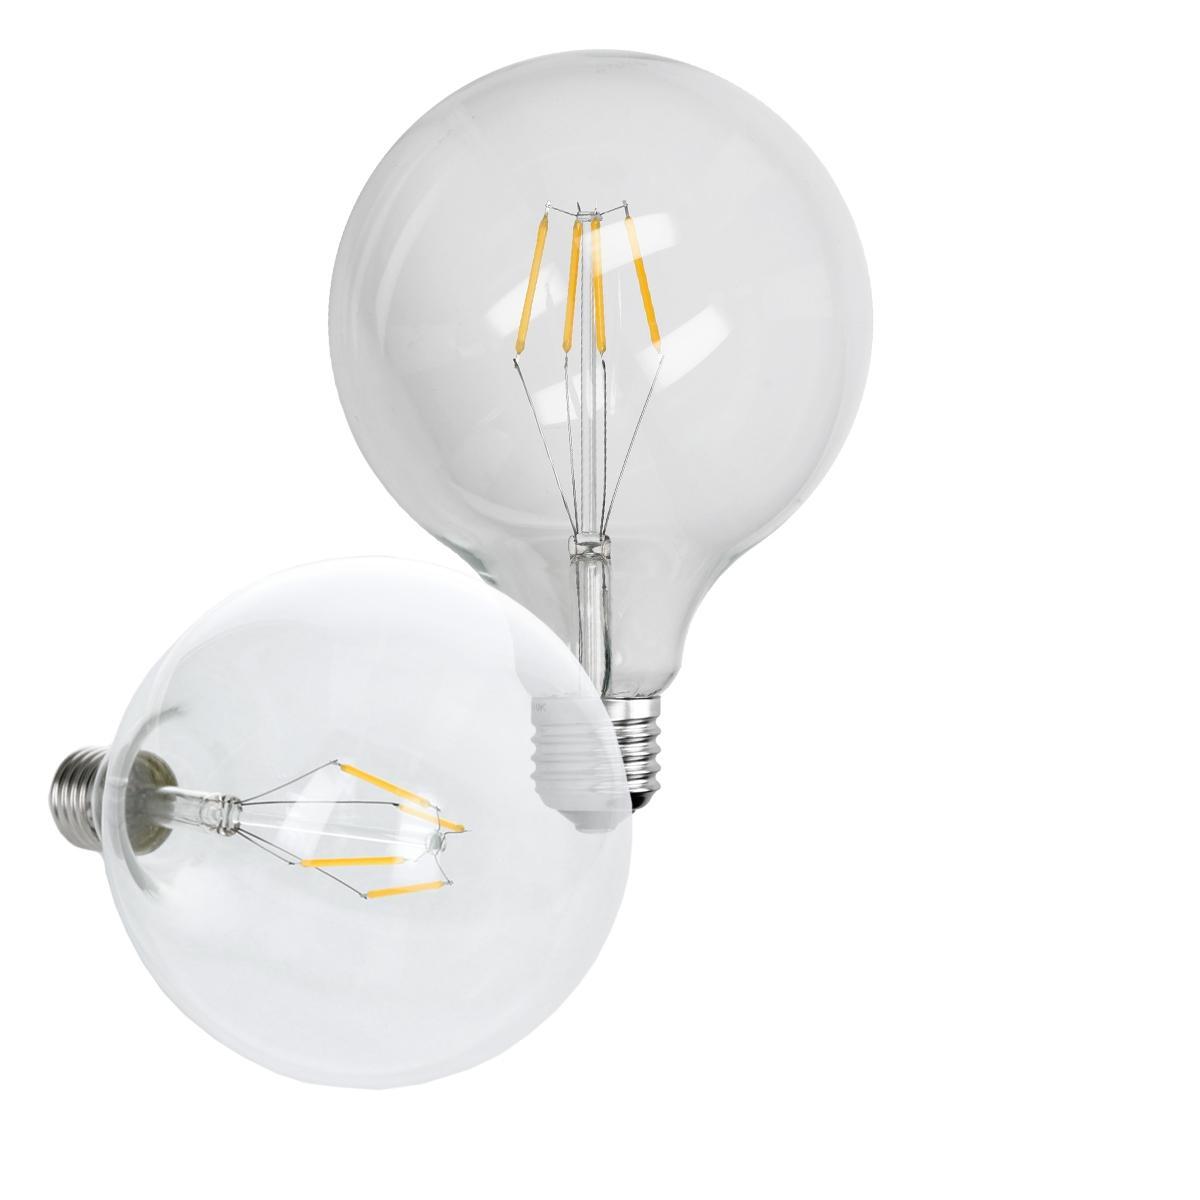 Ecd Germany 12 x ampoule LED gros filament E27 4W 125 mm blanc chaud